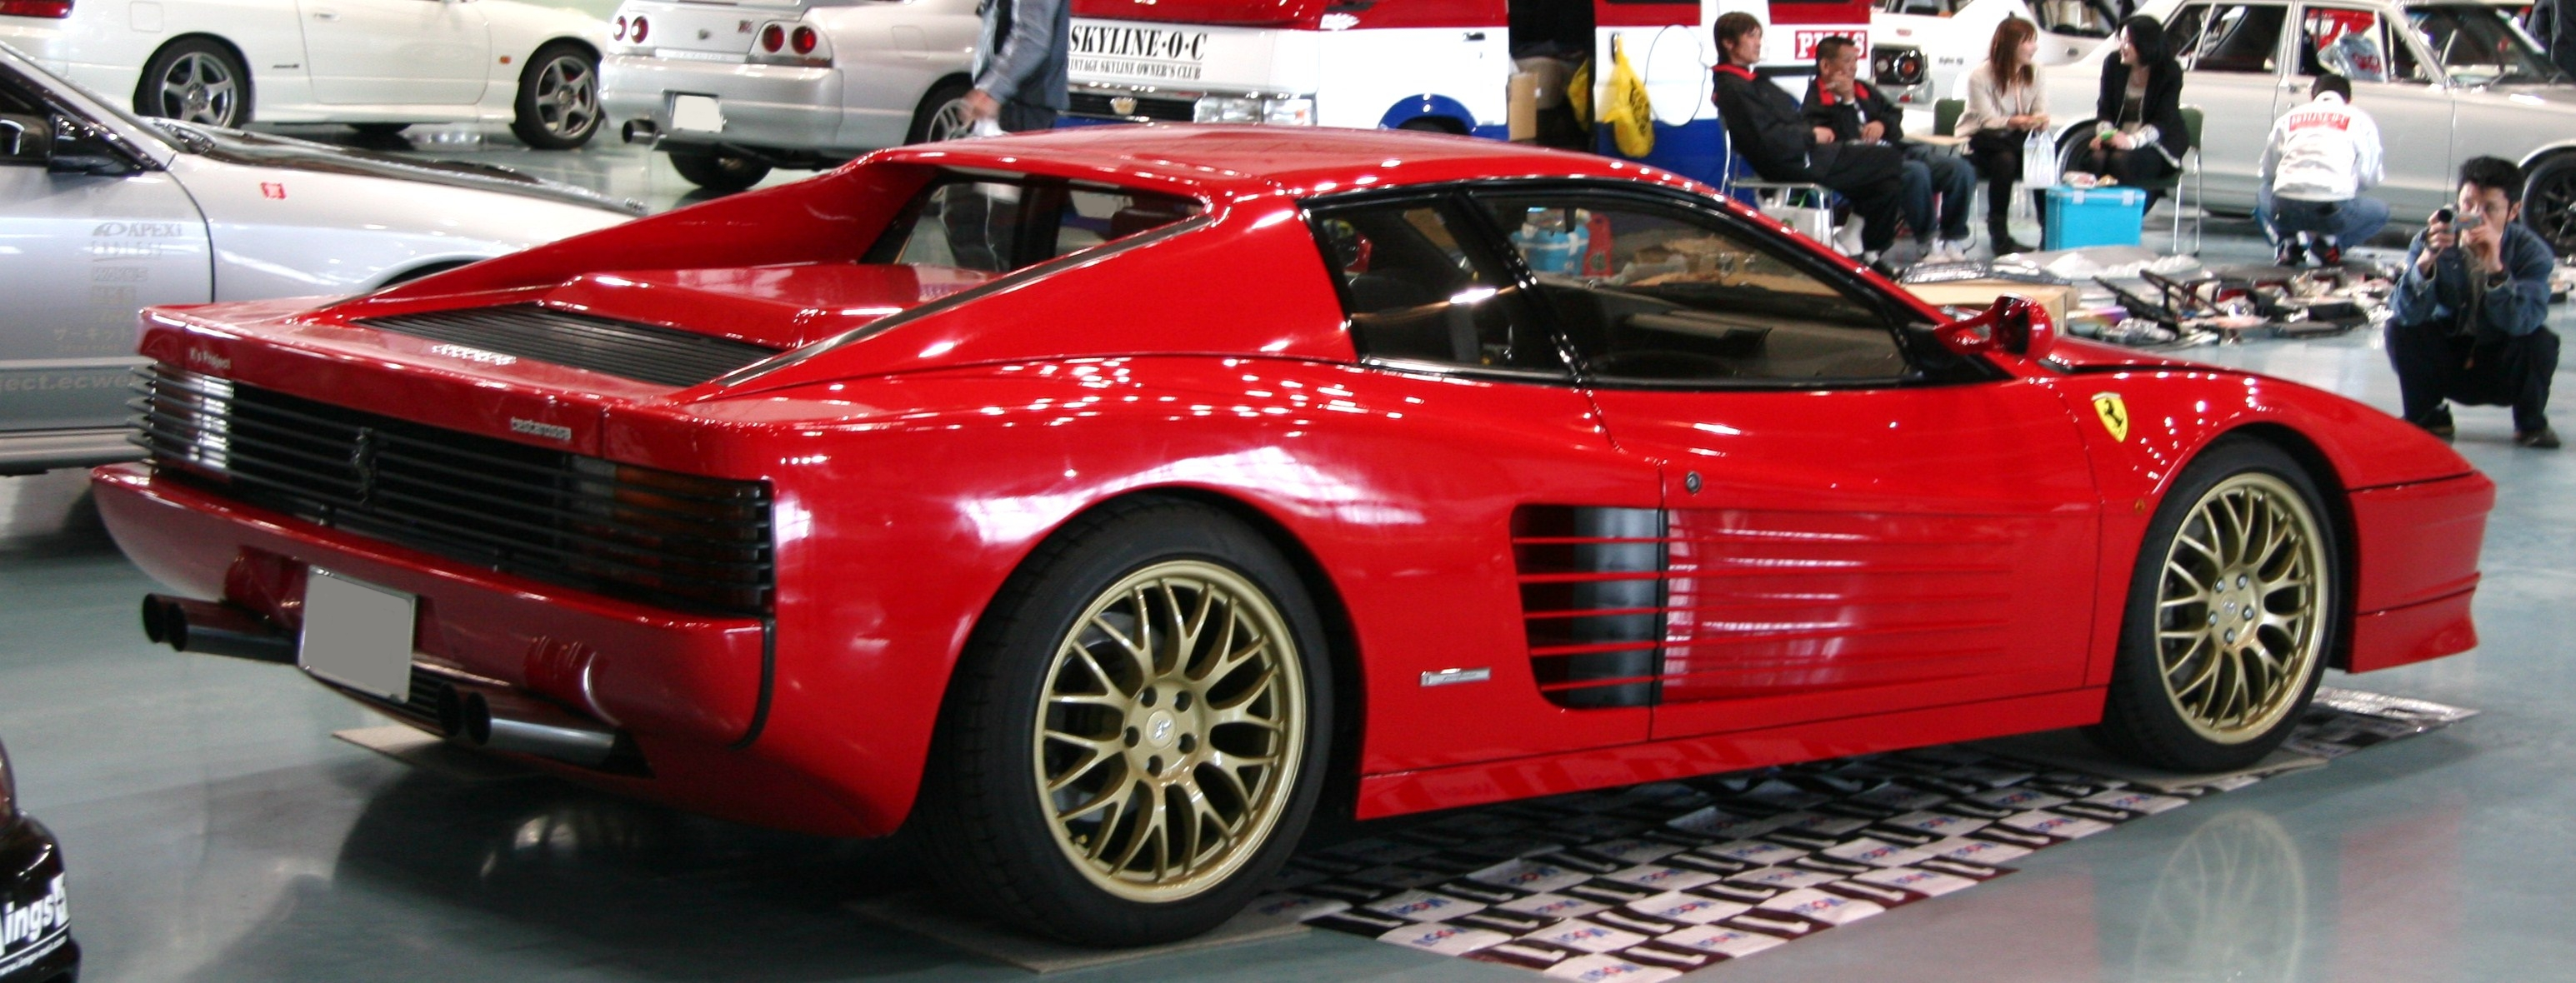 File:Ferrari Testarossa 01 rear.jpg - Wikimedia Commons